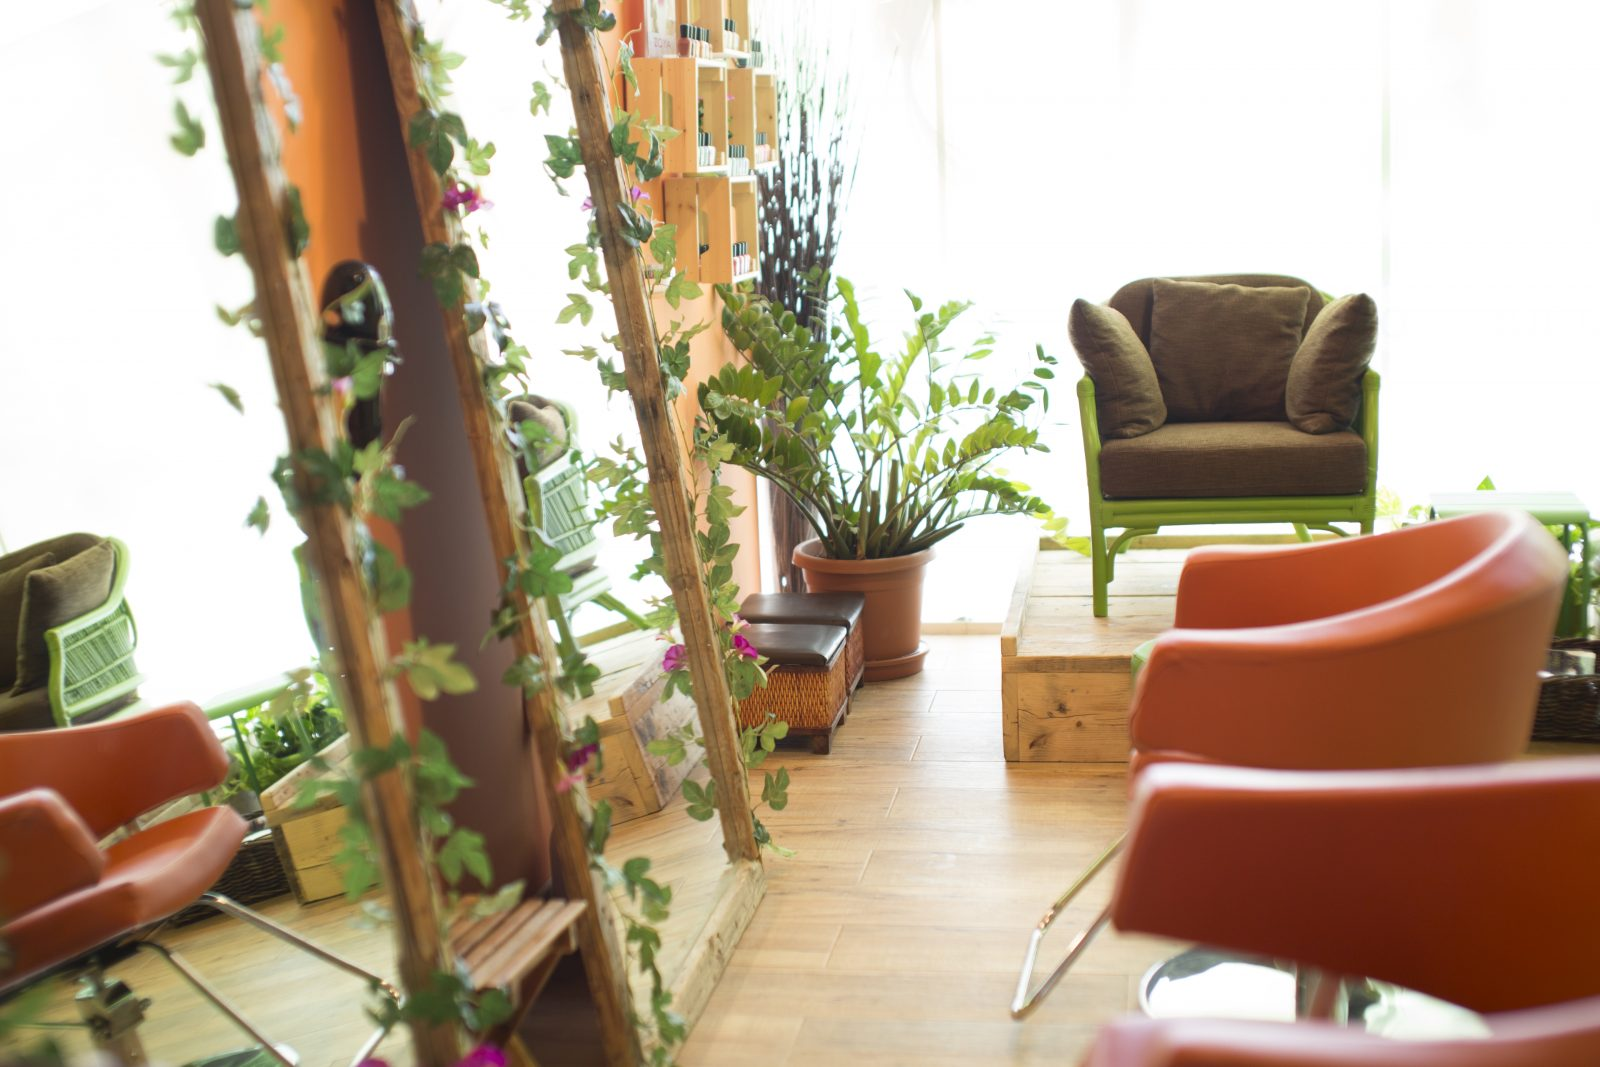 The Organic Glow Beauty Lounge in JVC